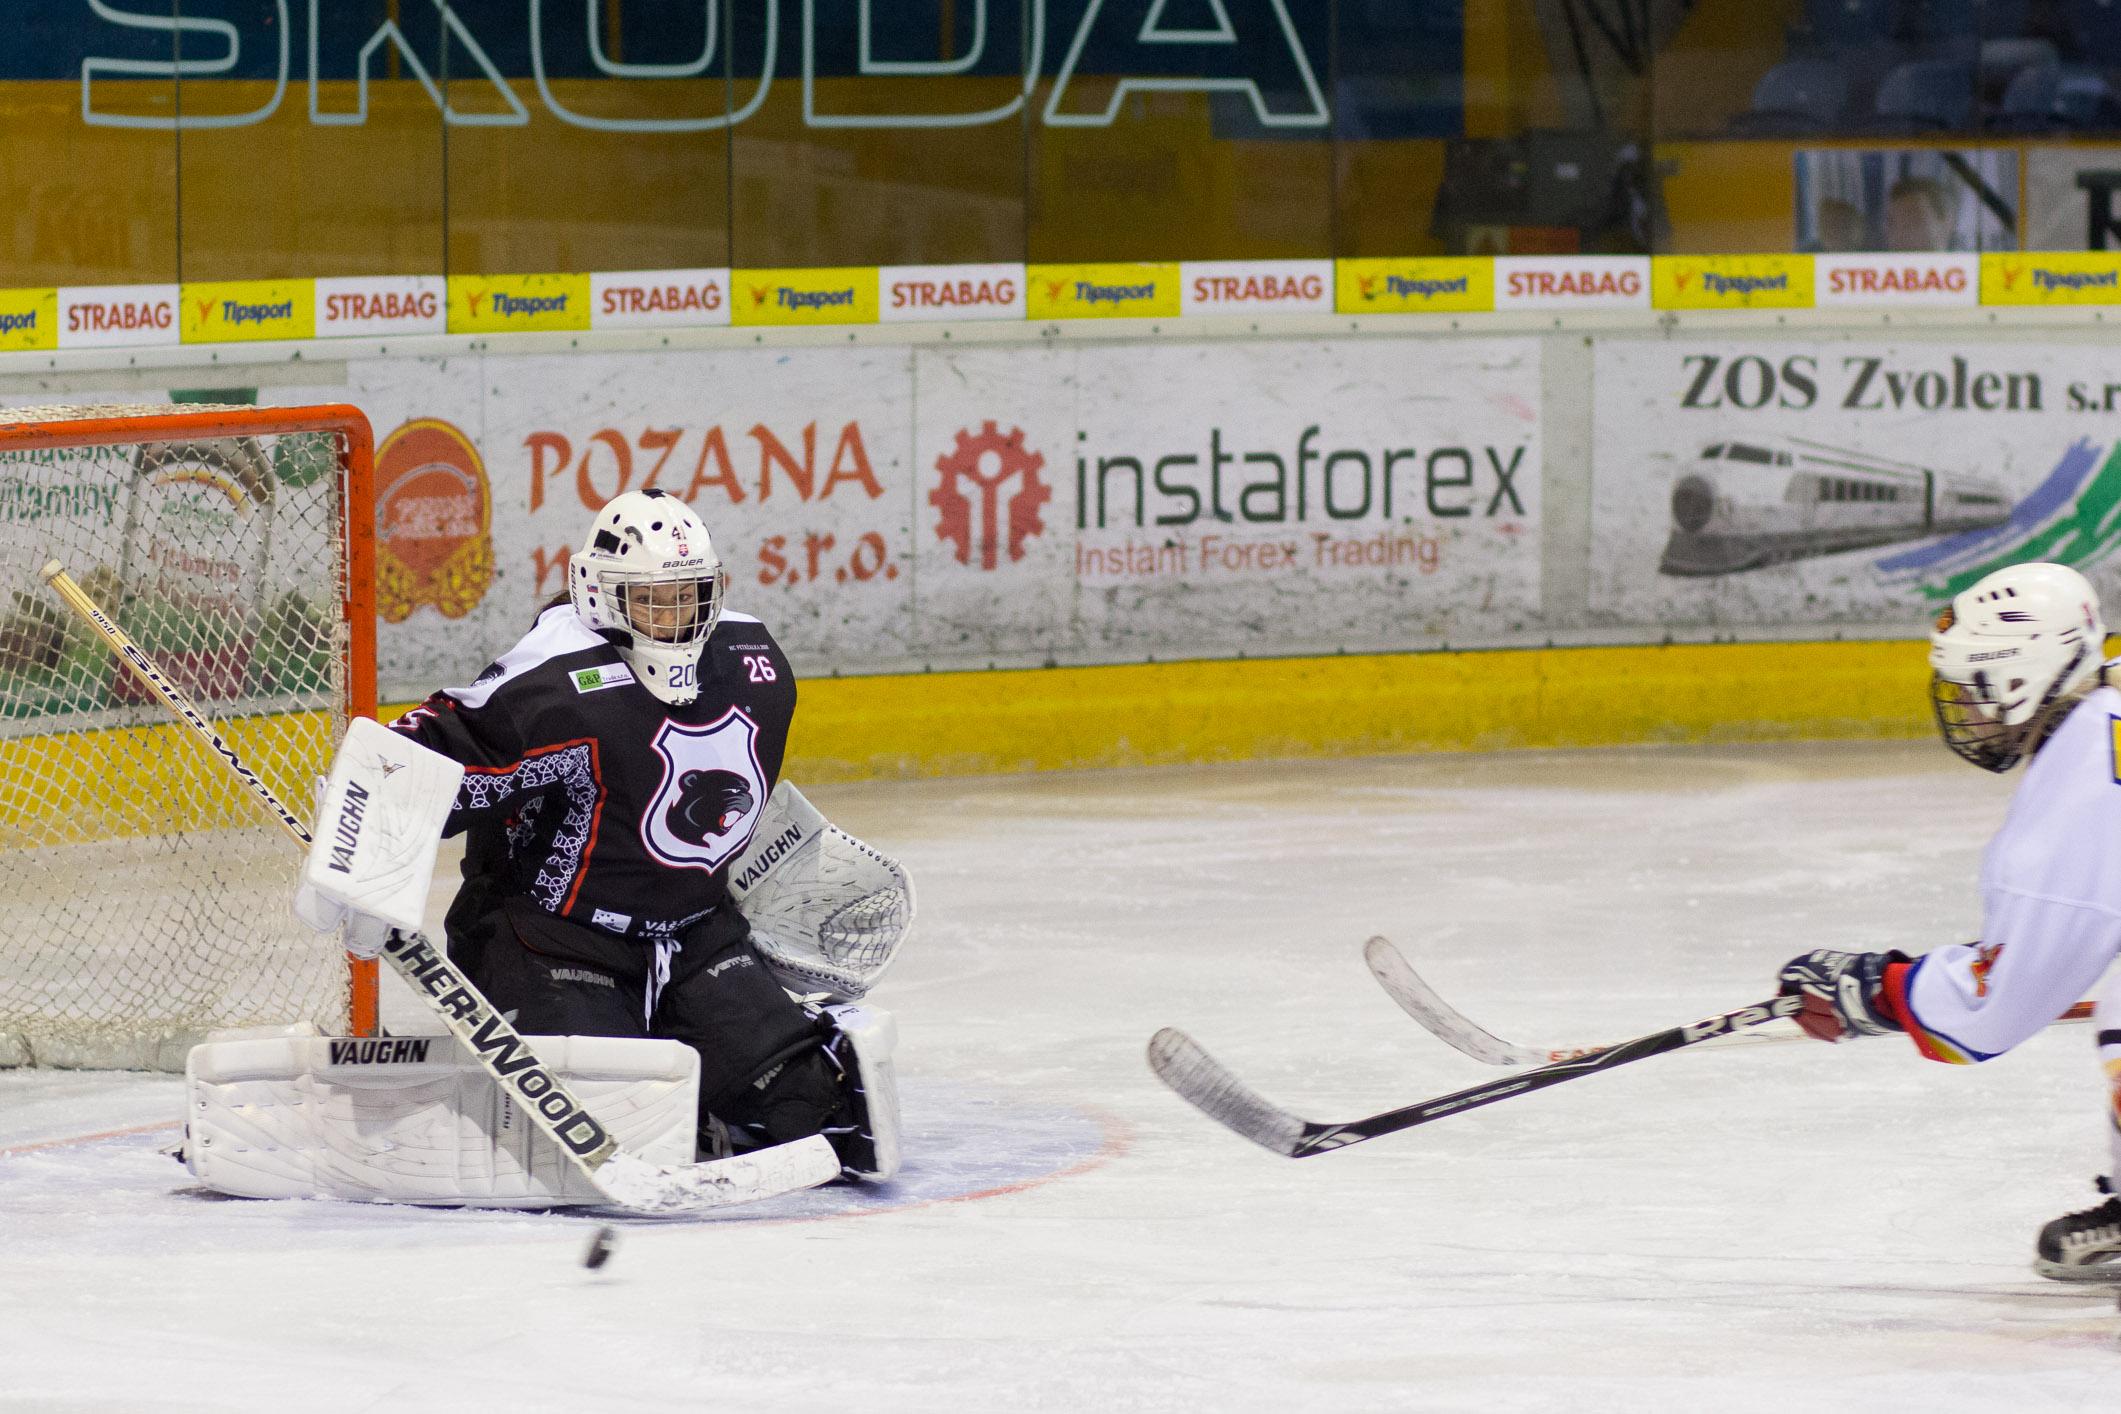 zhkm-zvolen-hc-petrzalka-hokej-6